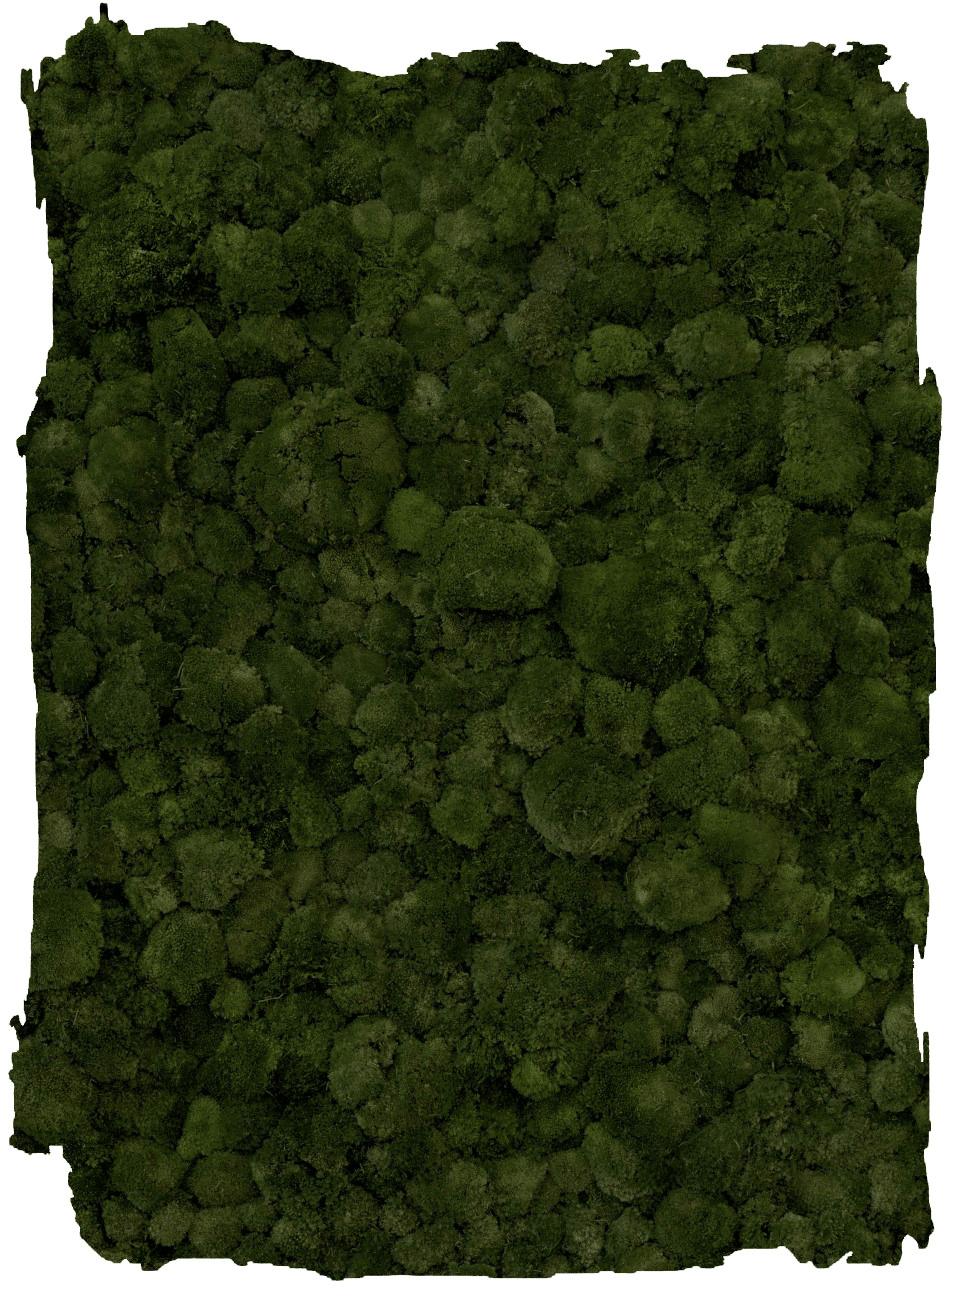 Bolmos Moss Green